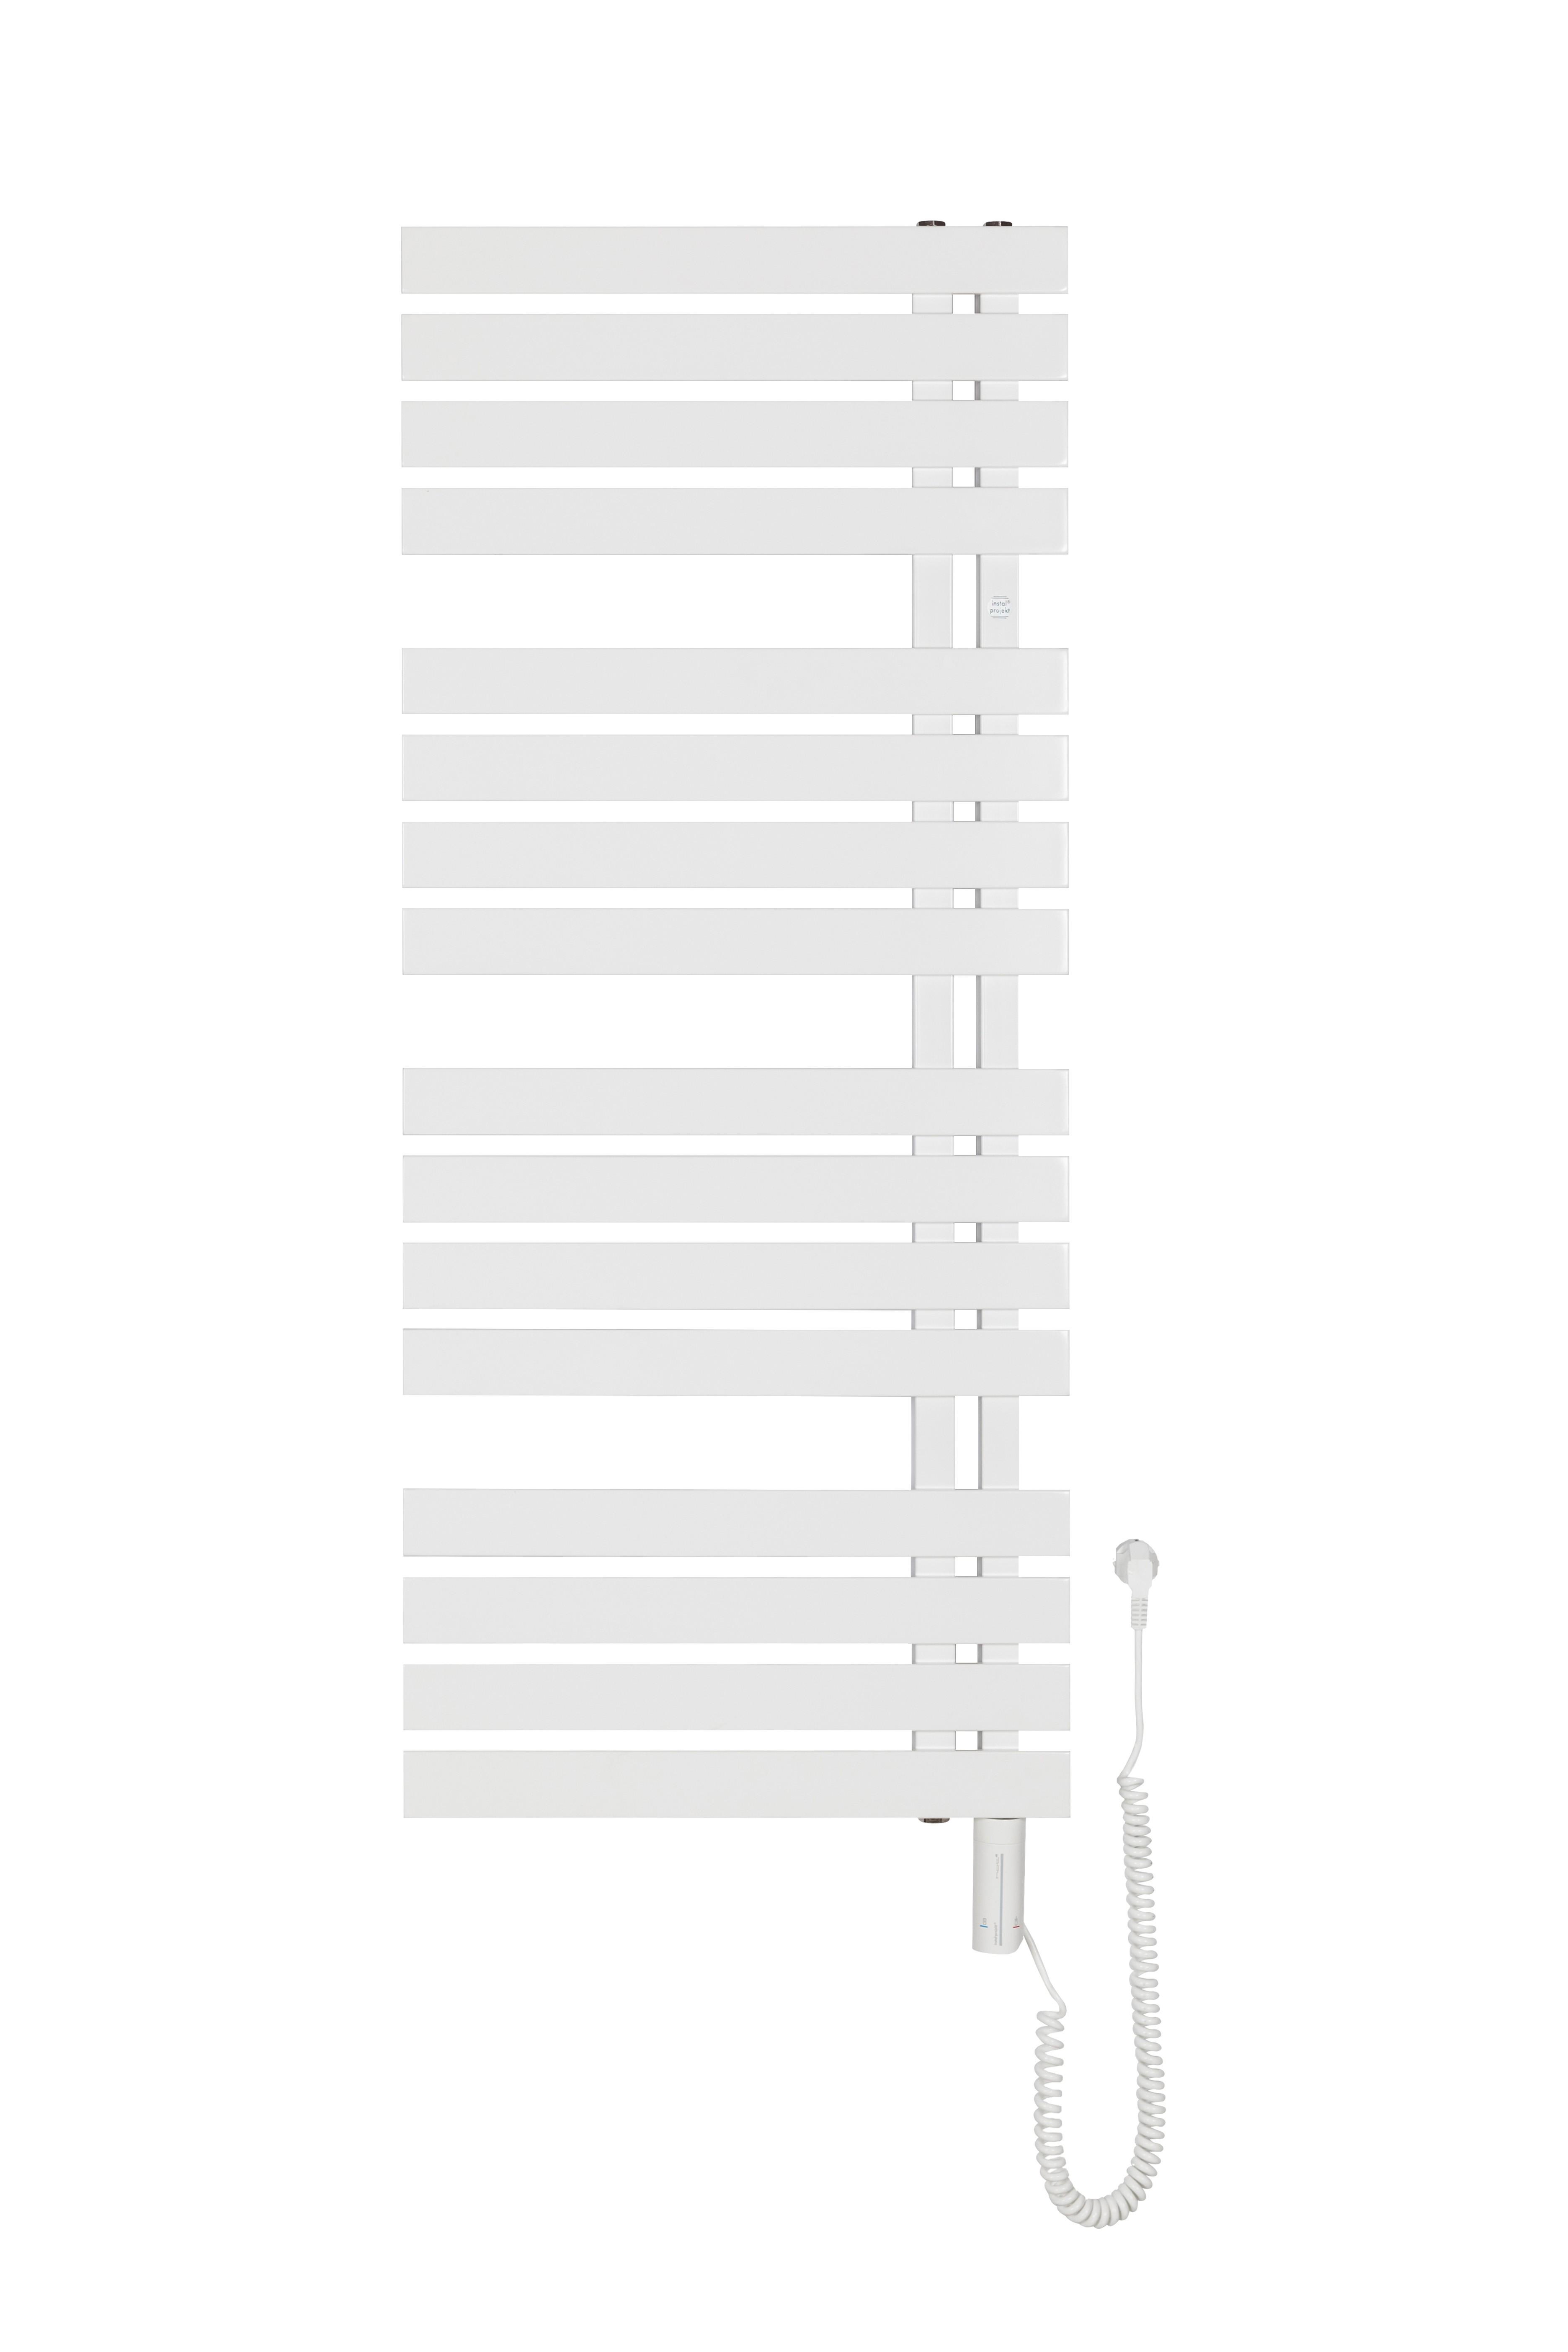 HOPA Koupelnový elektrický radiátor sušák POP STAR ELECTRO Barva radiátoru Bílá, Rozměr radiátoru HL 500 × 980 mm, výkon 300 W RADPOPEL509035